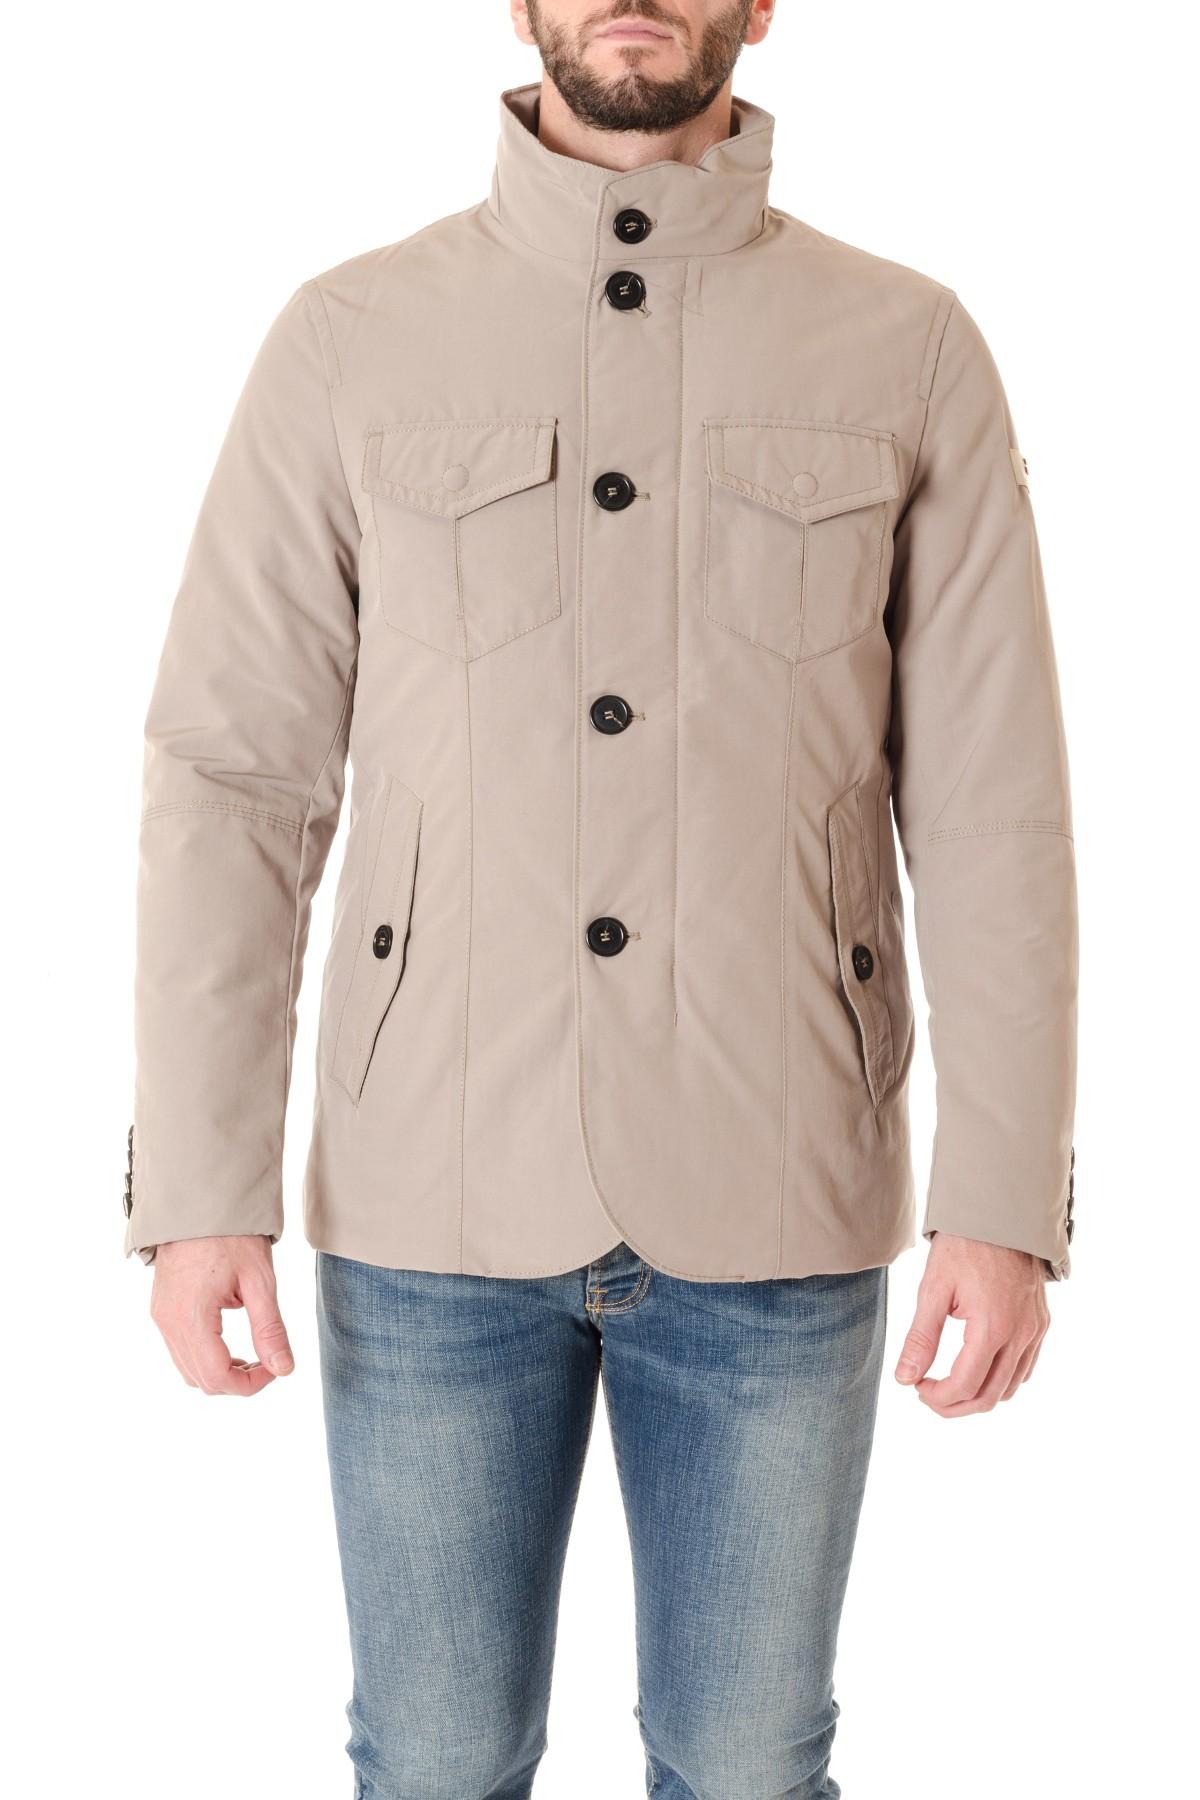 online retailer bd43a 0df13 PEUTEREY Giubbotto beige per uomo A/I